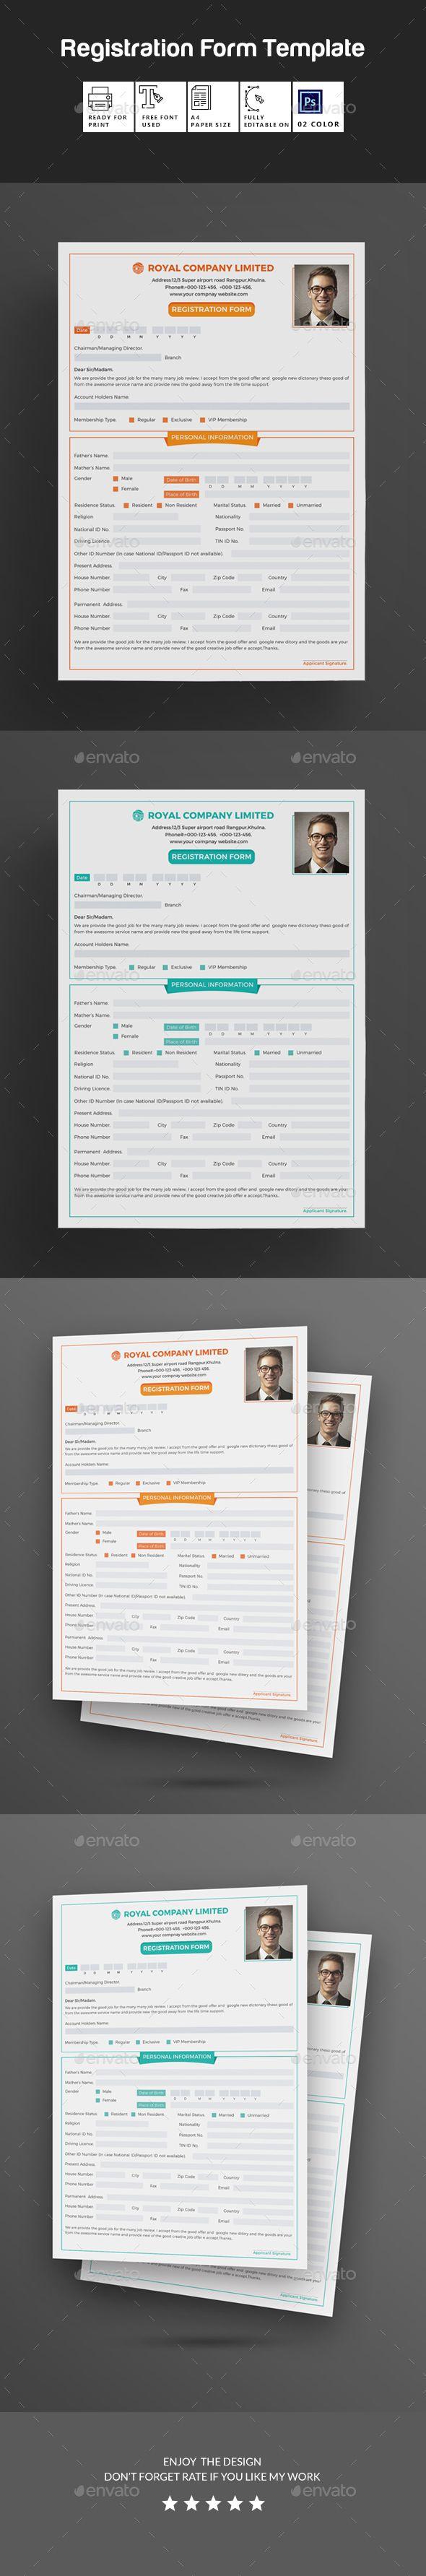 Registration #Form - #Miscellaneous Print Templates Download here:  https://graphicriver.net/item/registration-form/20387376?ref=alena994